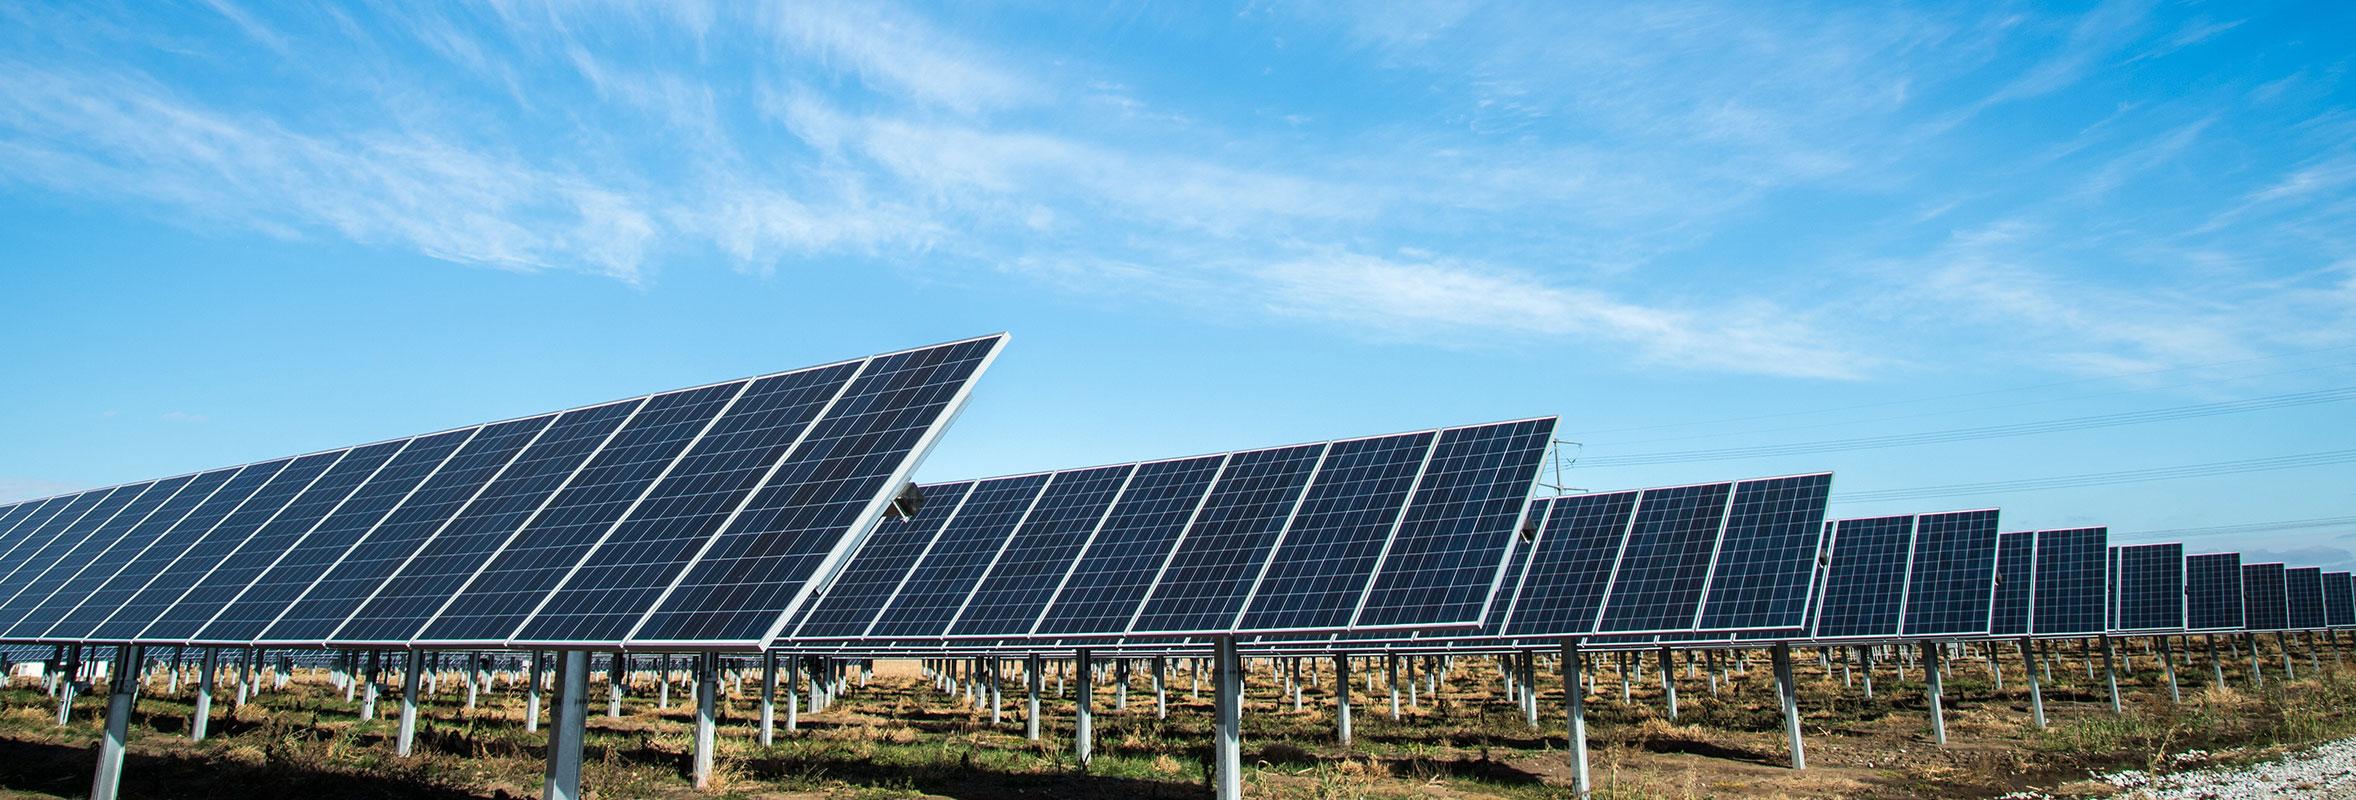 Sewanee-Solar_Solar-Farm-2.jpg